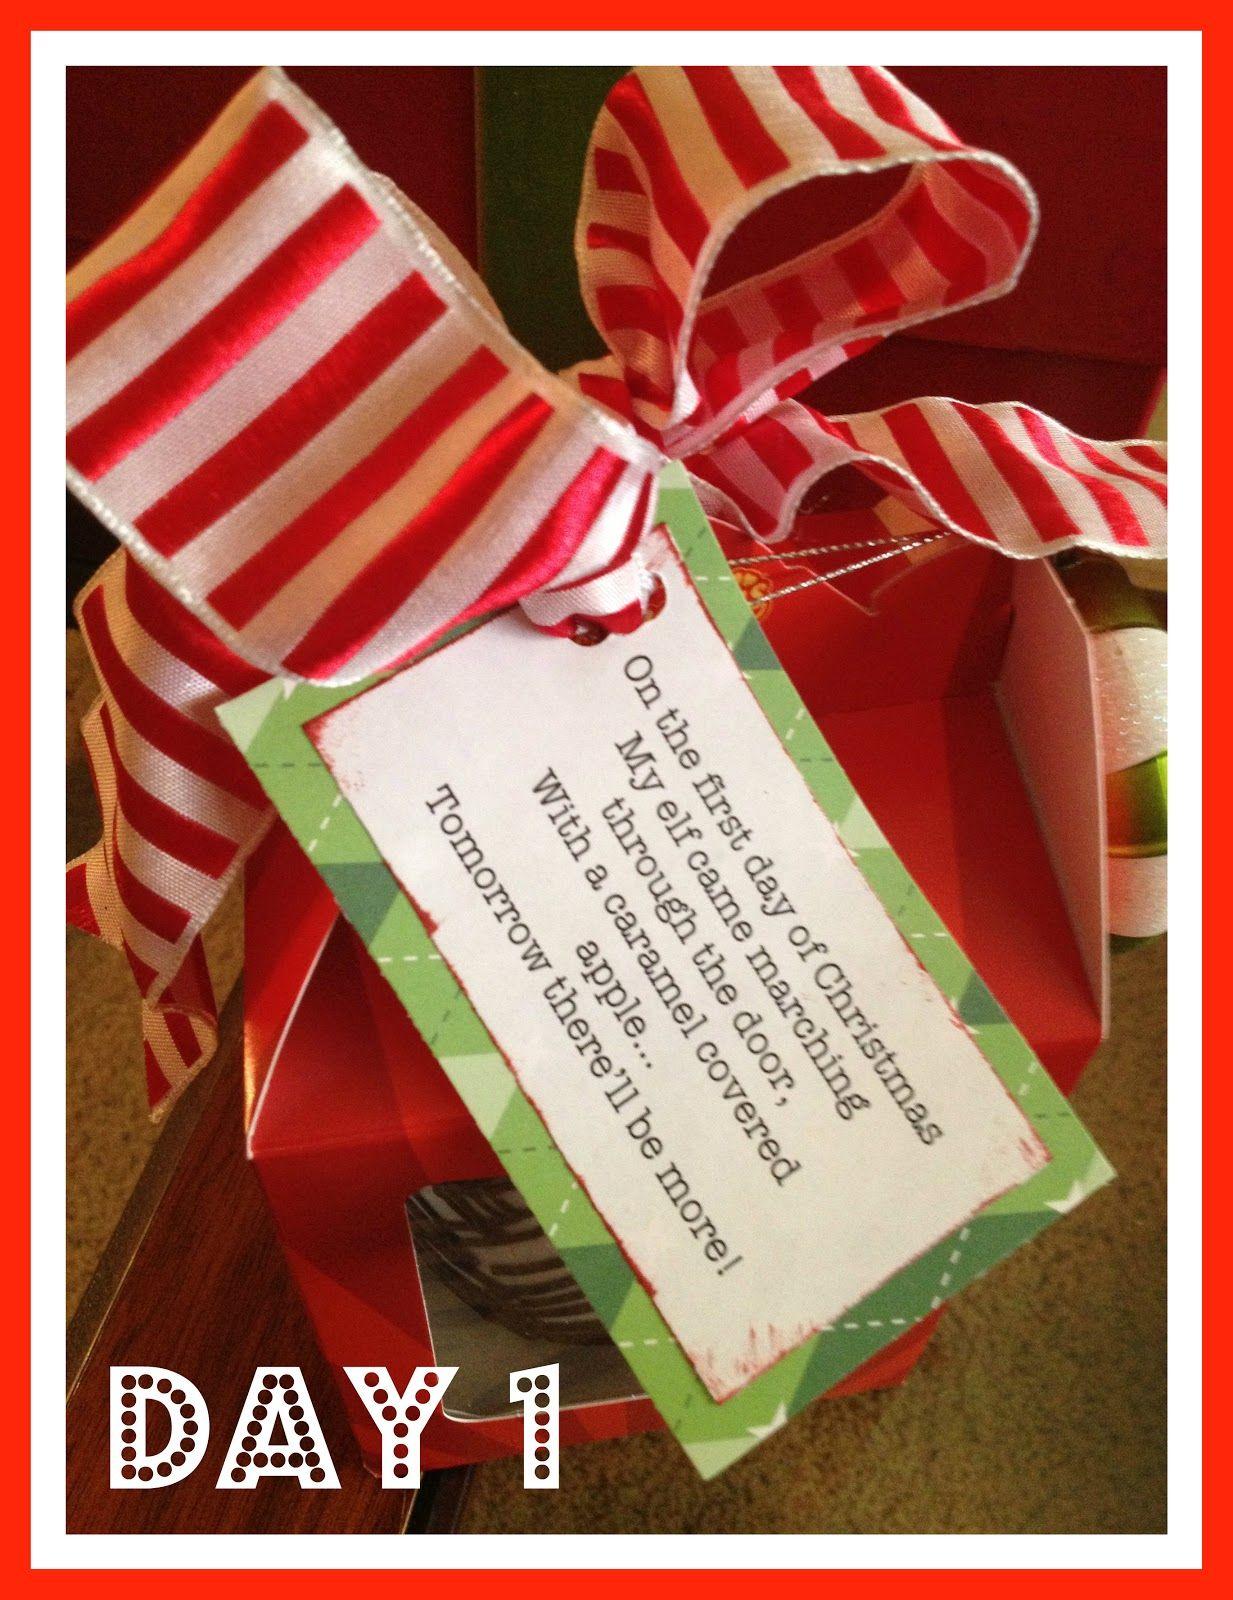 12 Days Of Christmas Craft Ideas Part - 45: 12 Days Of TEACHER Christmas. @Cindy Little @Courtney Shelton